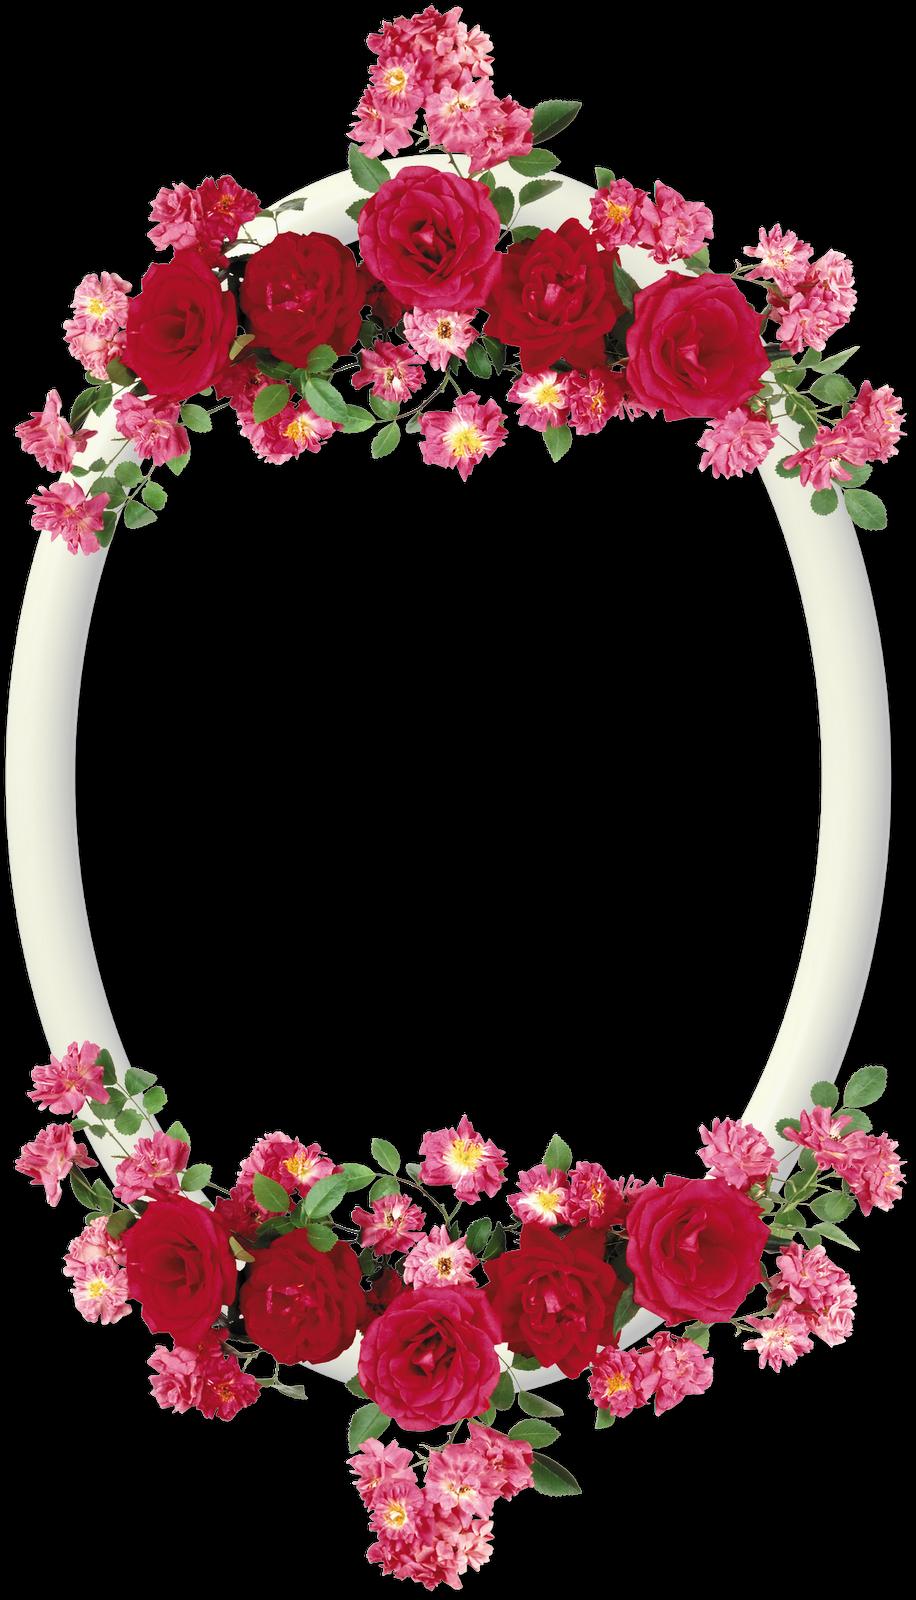 Marcos bonitos de flores imagui - Marcos redondos para cuadros ...